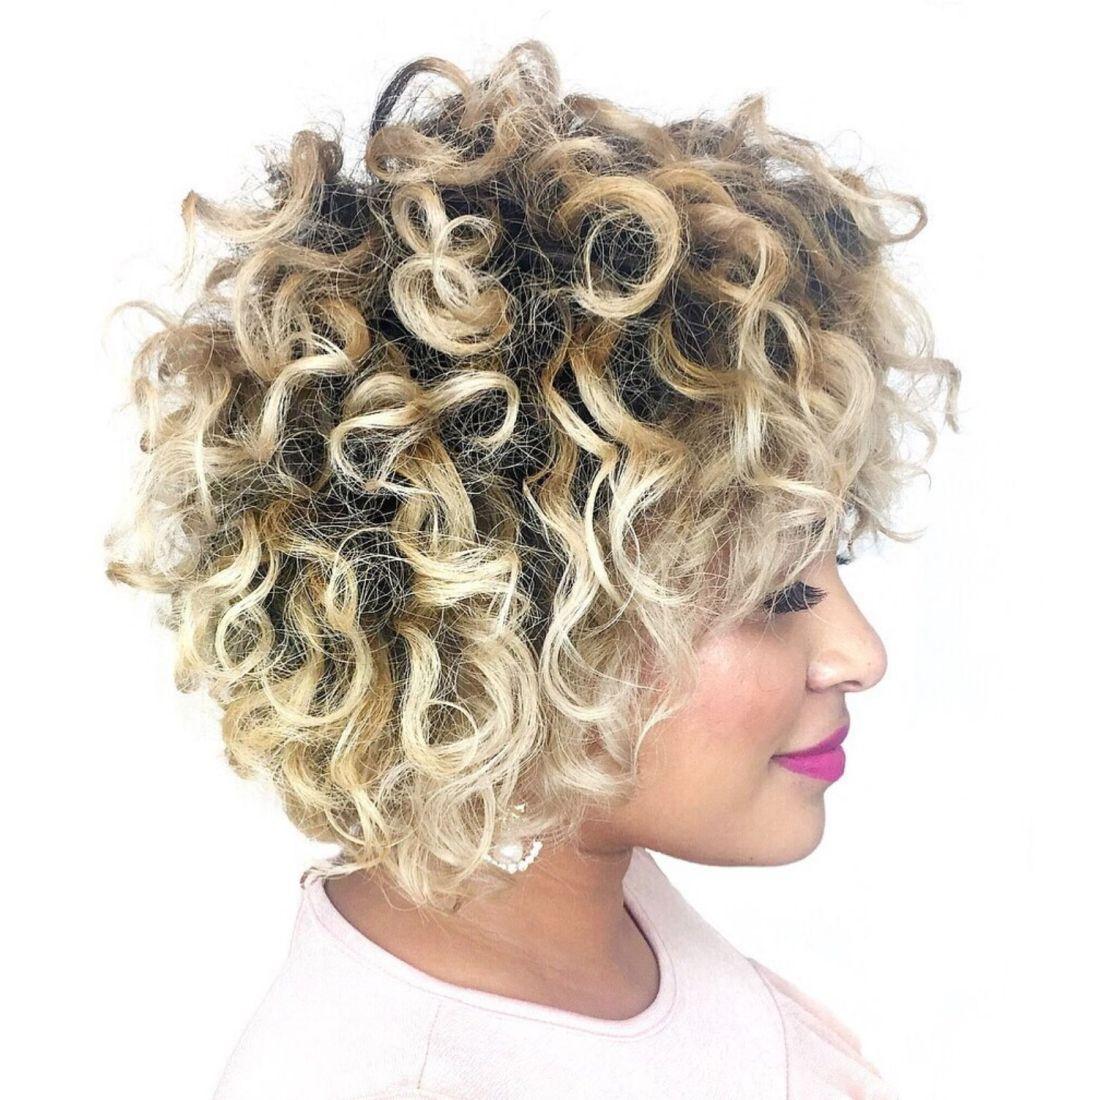 41++ Blonde balayage short curly hair ideas